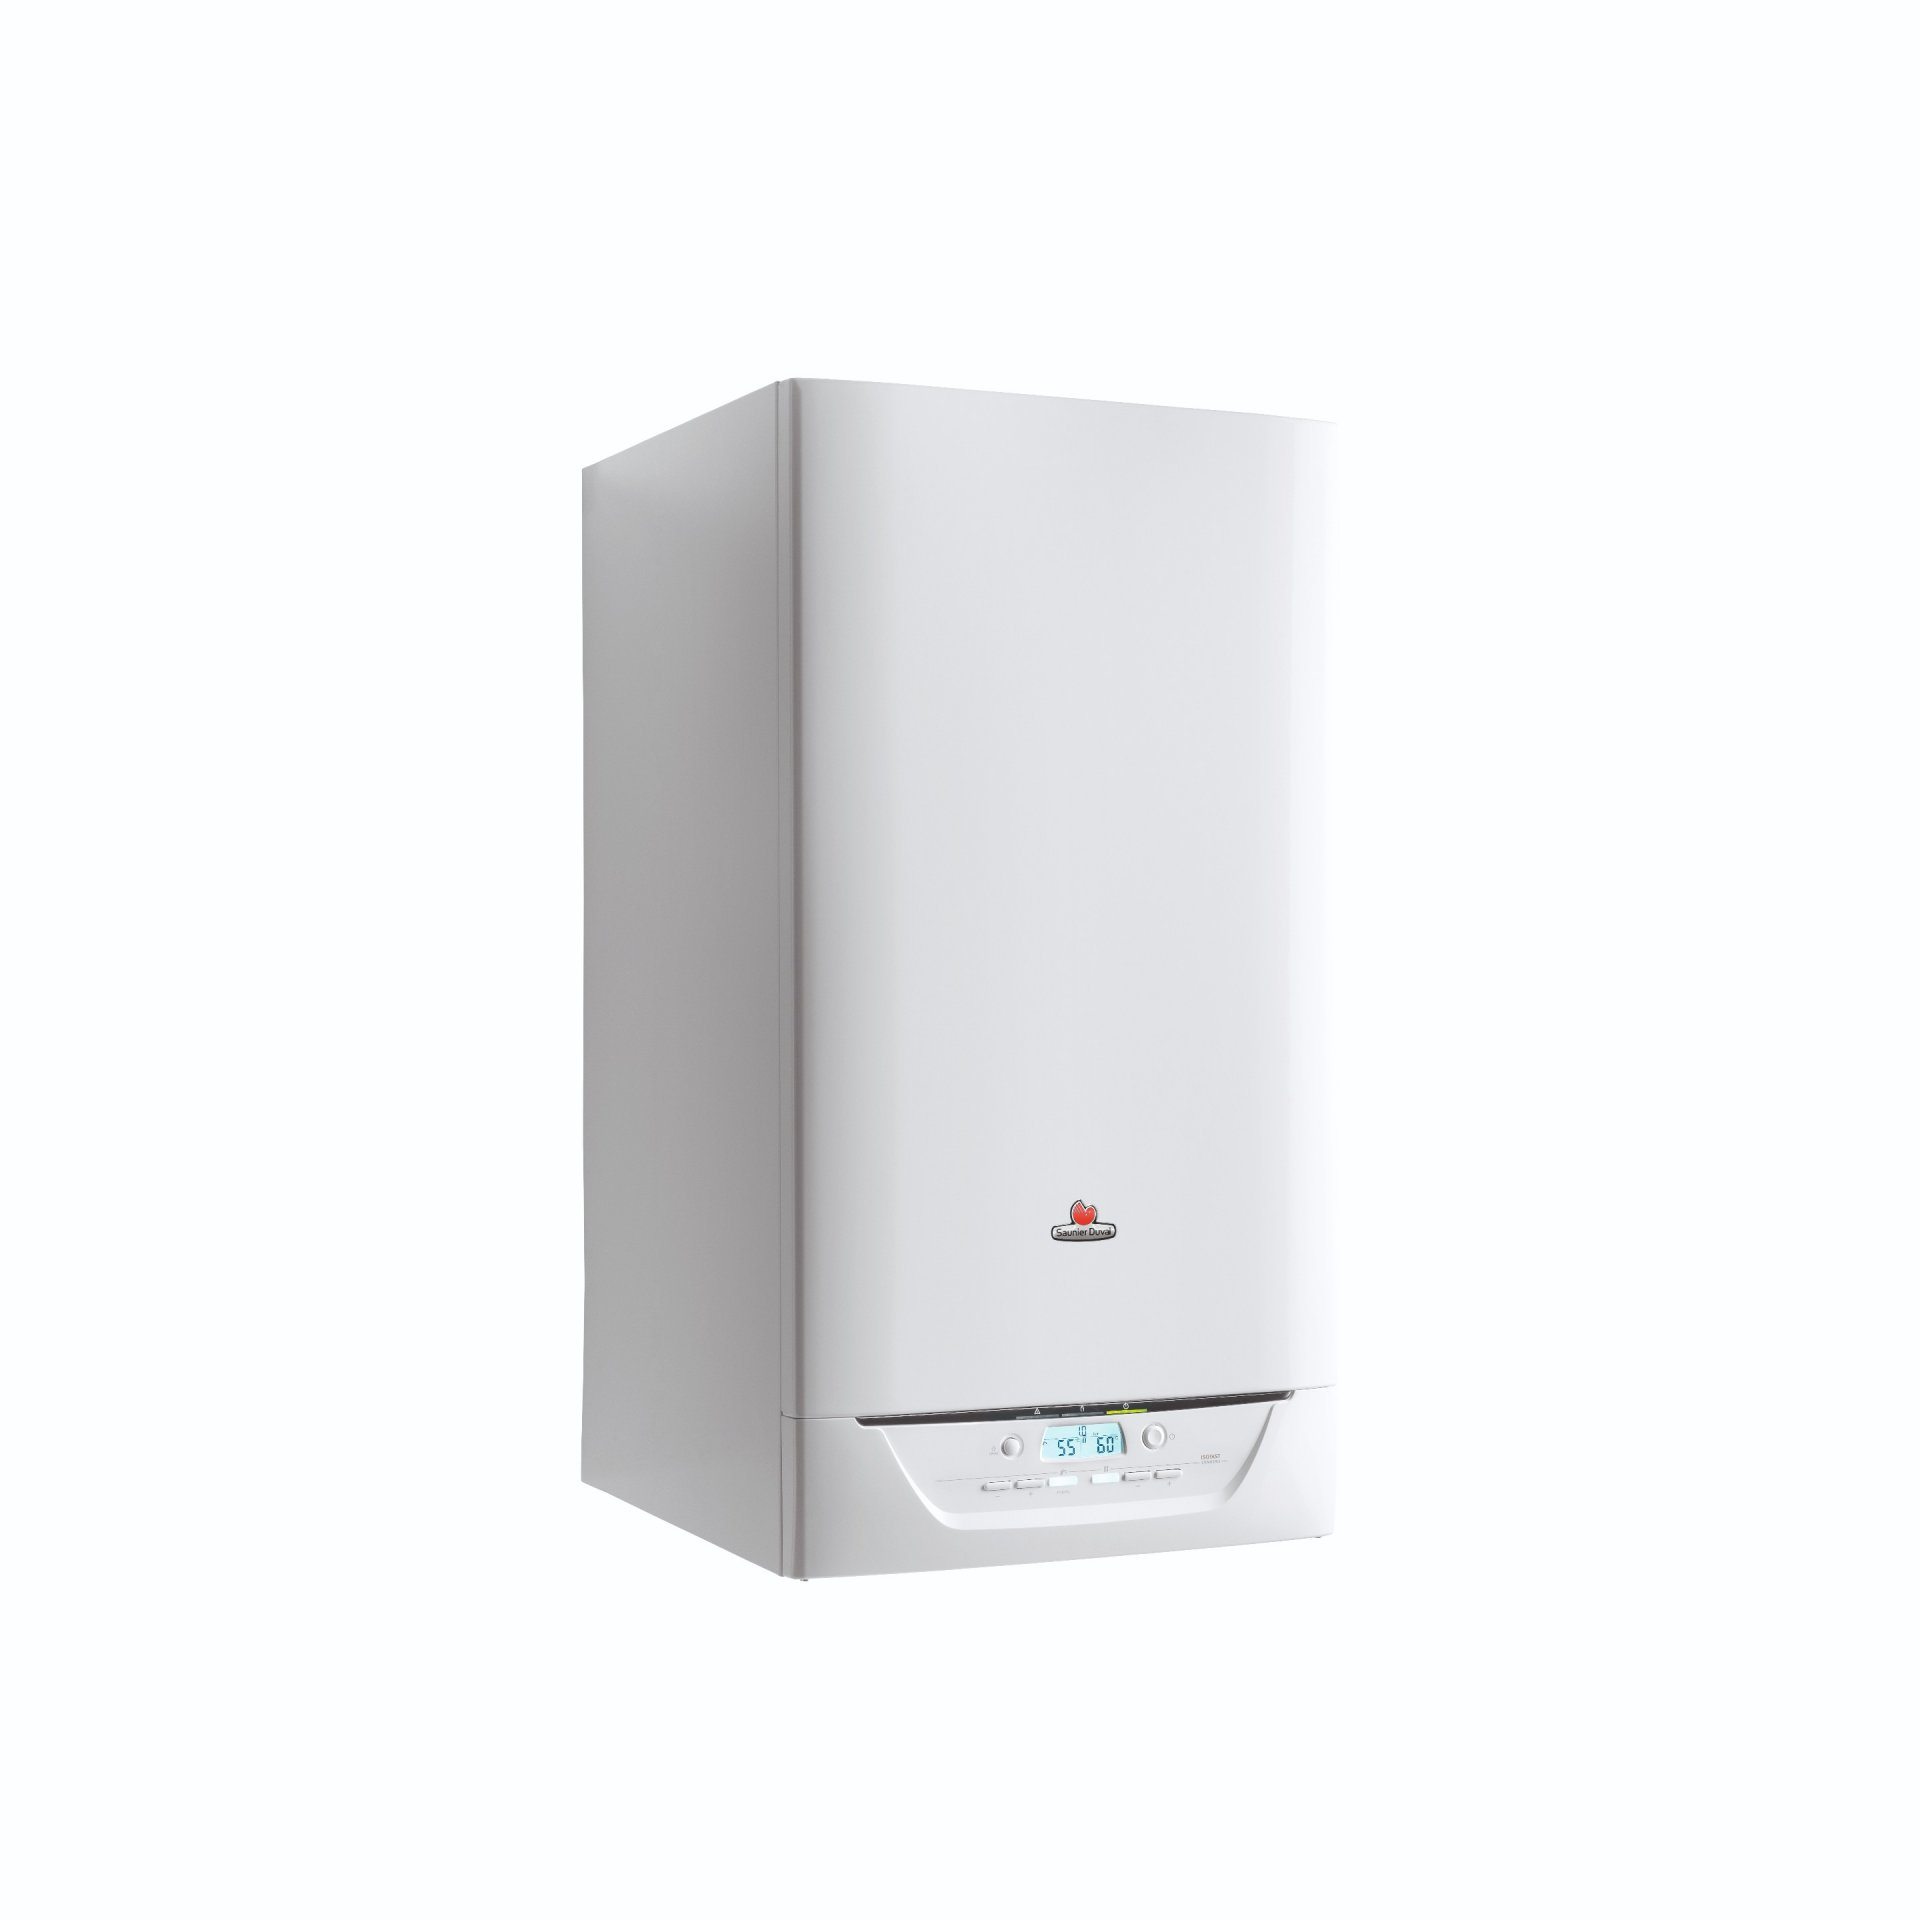 isofast condens f35 thermogest